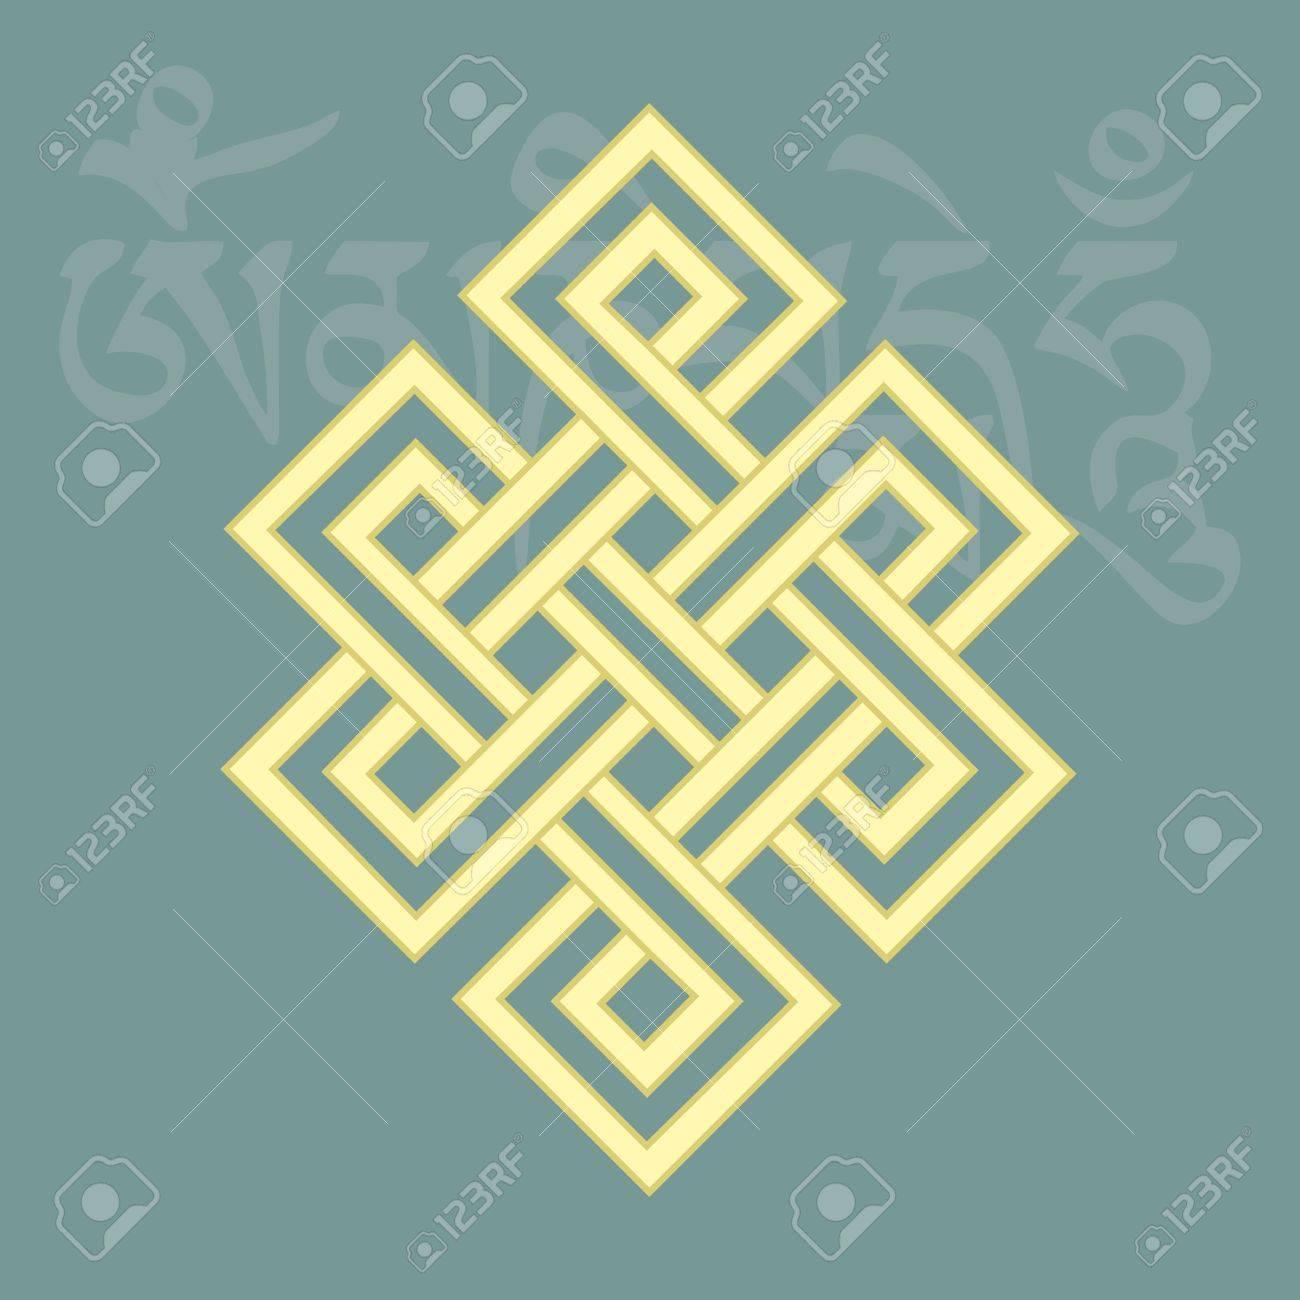 Endless Knotone Of Eight Auspicious Buddhist Religious Symbols